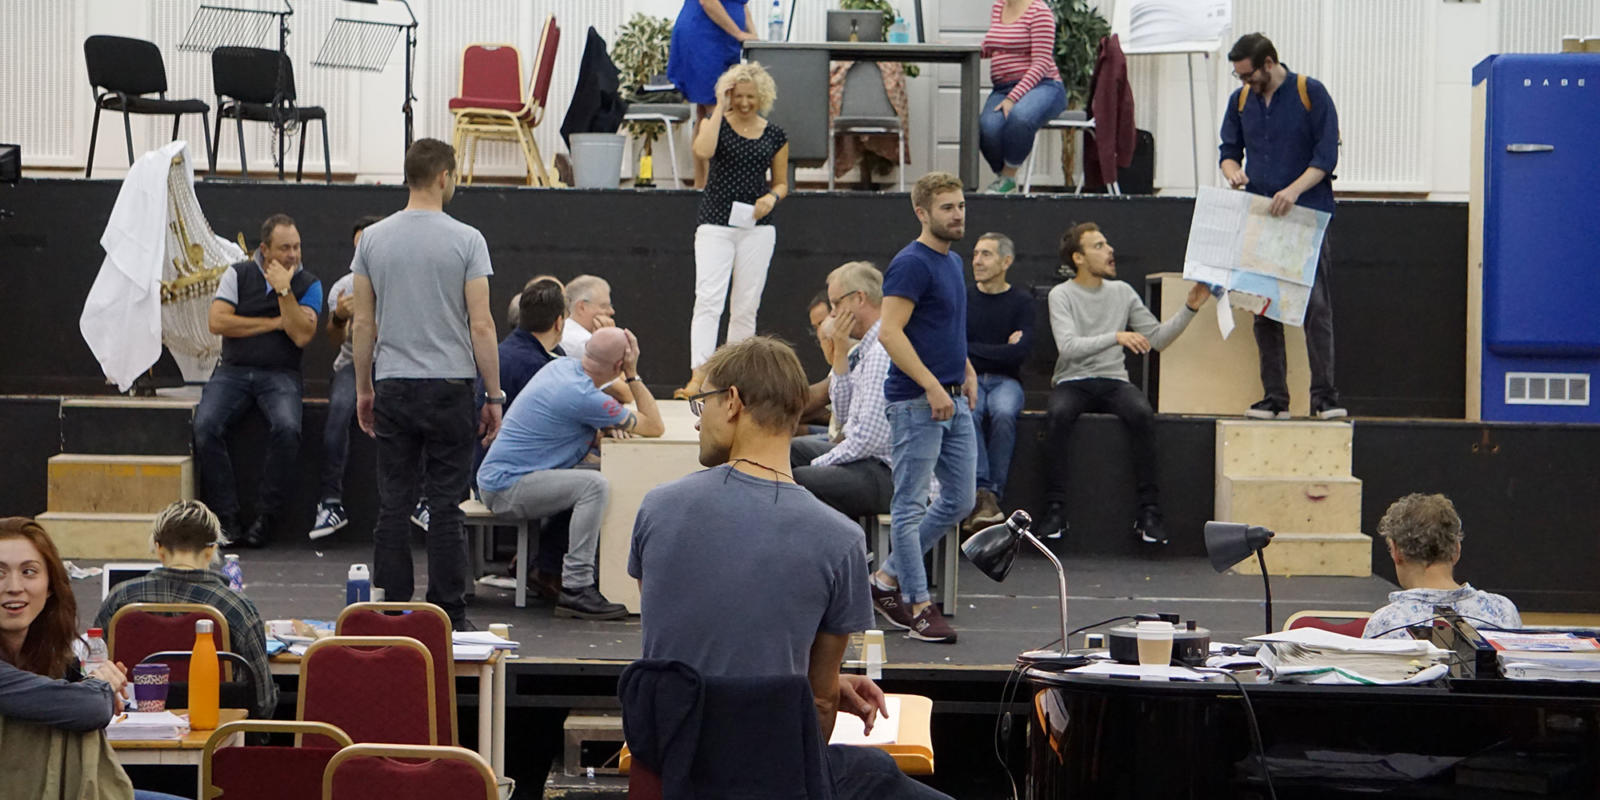 ENO Studio Live Paul Bunyan: cast and crew rehearsing